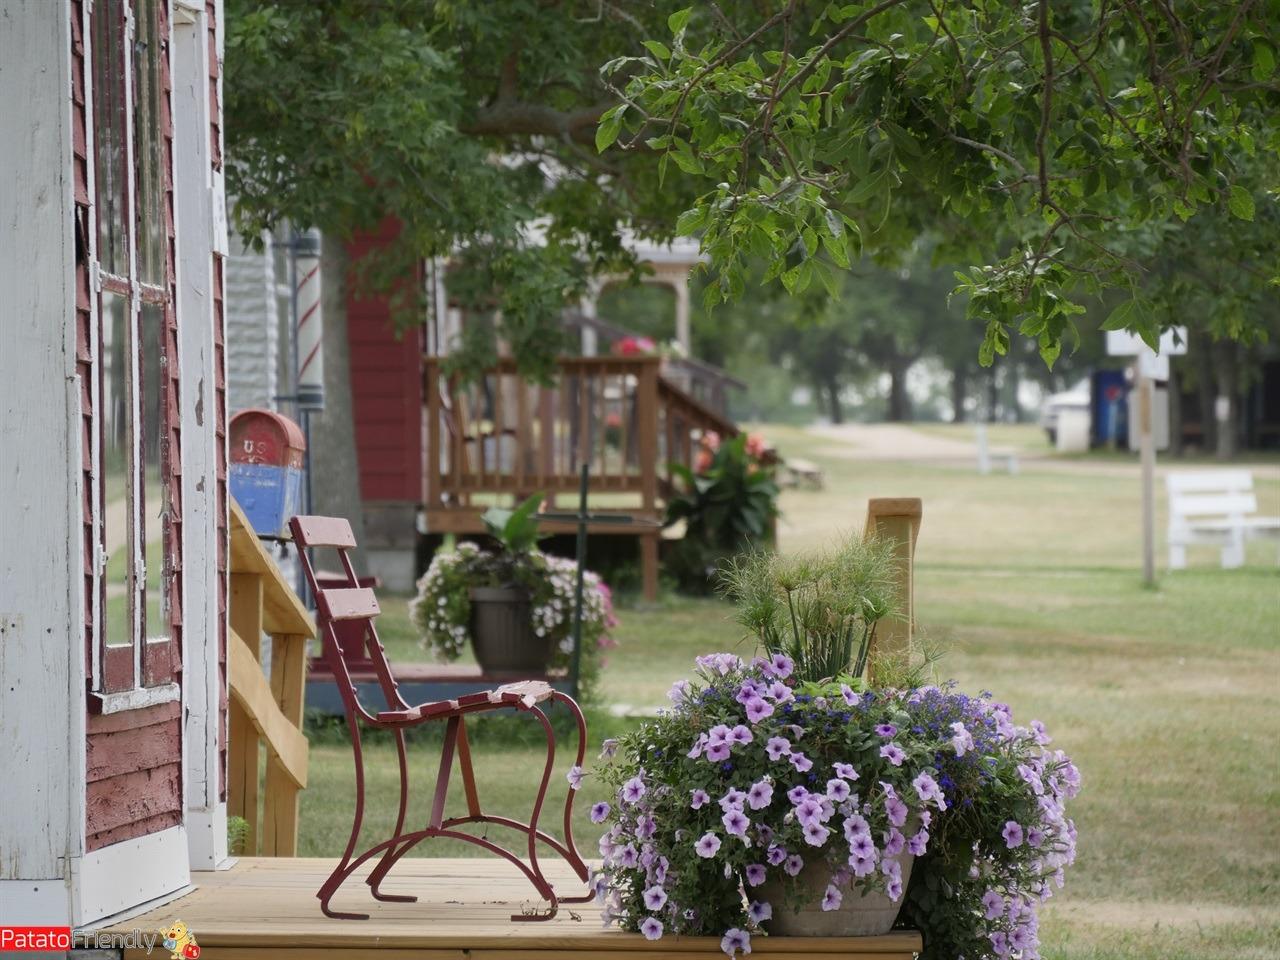 [cml_media_alt id='11542']Viaggio in South Dakota - The Historic Prairie Village[/cml_media_alt]